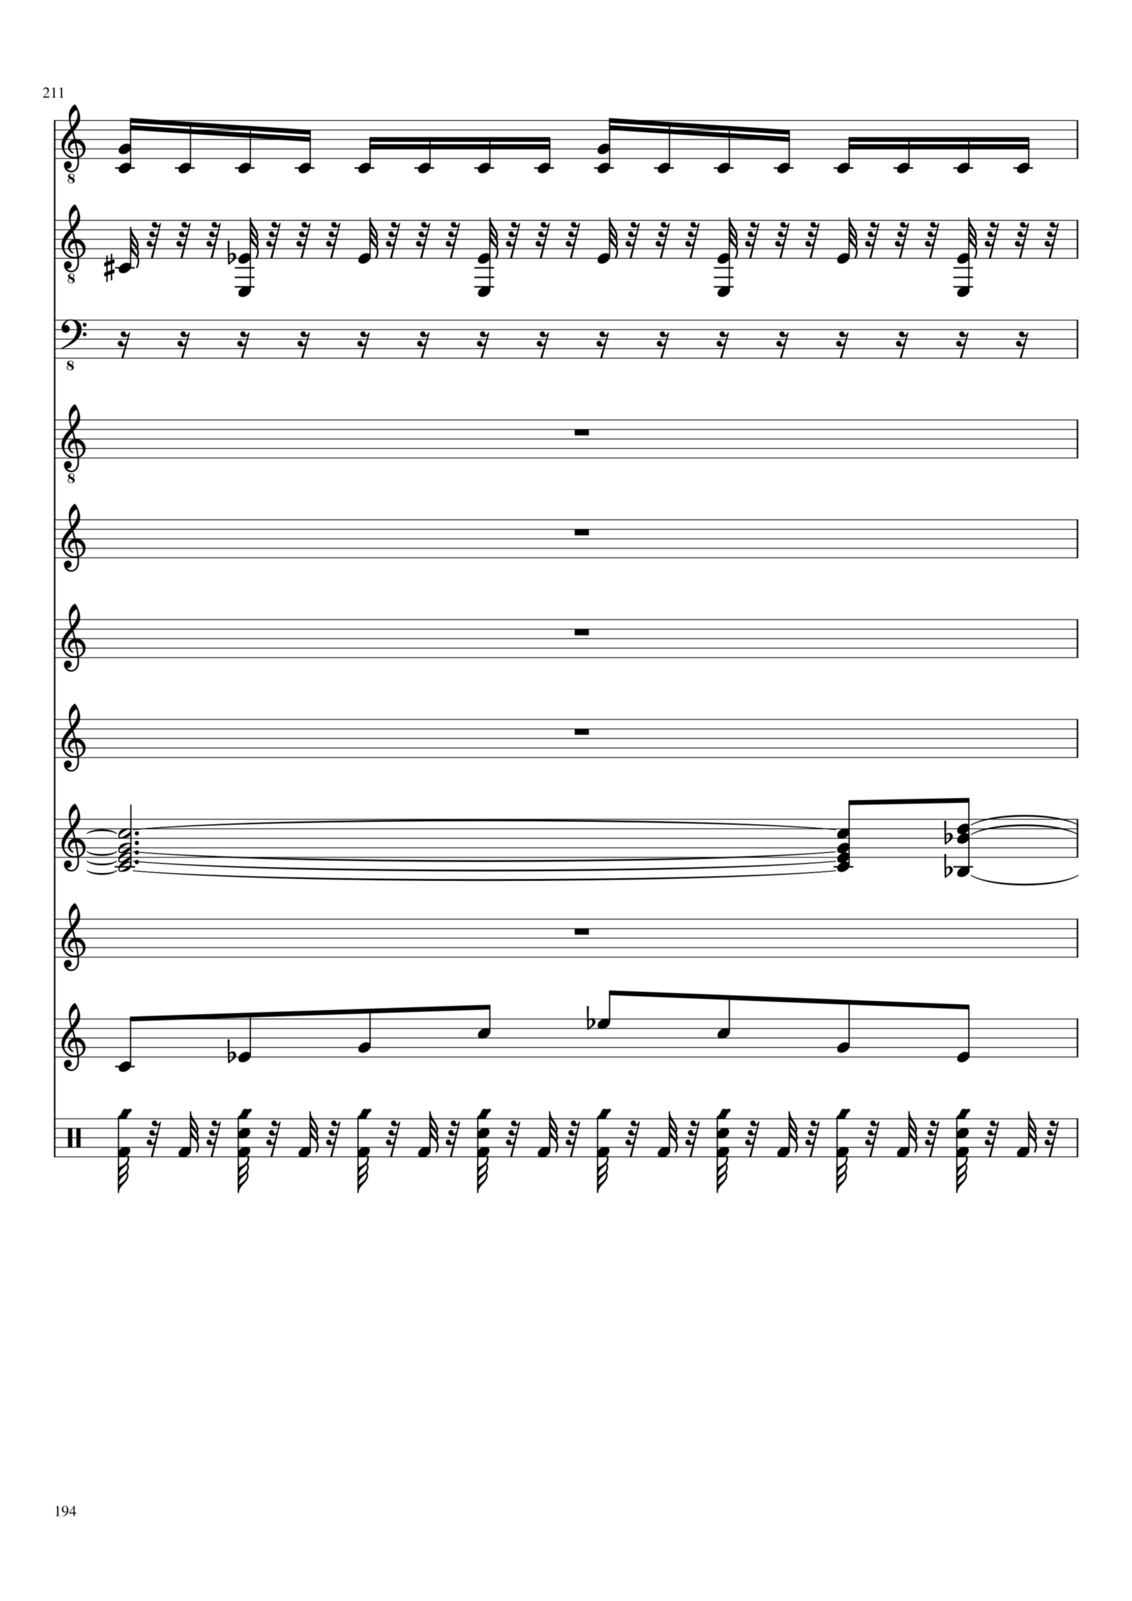 Belyiy sokol slide, Image 194